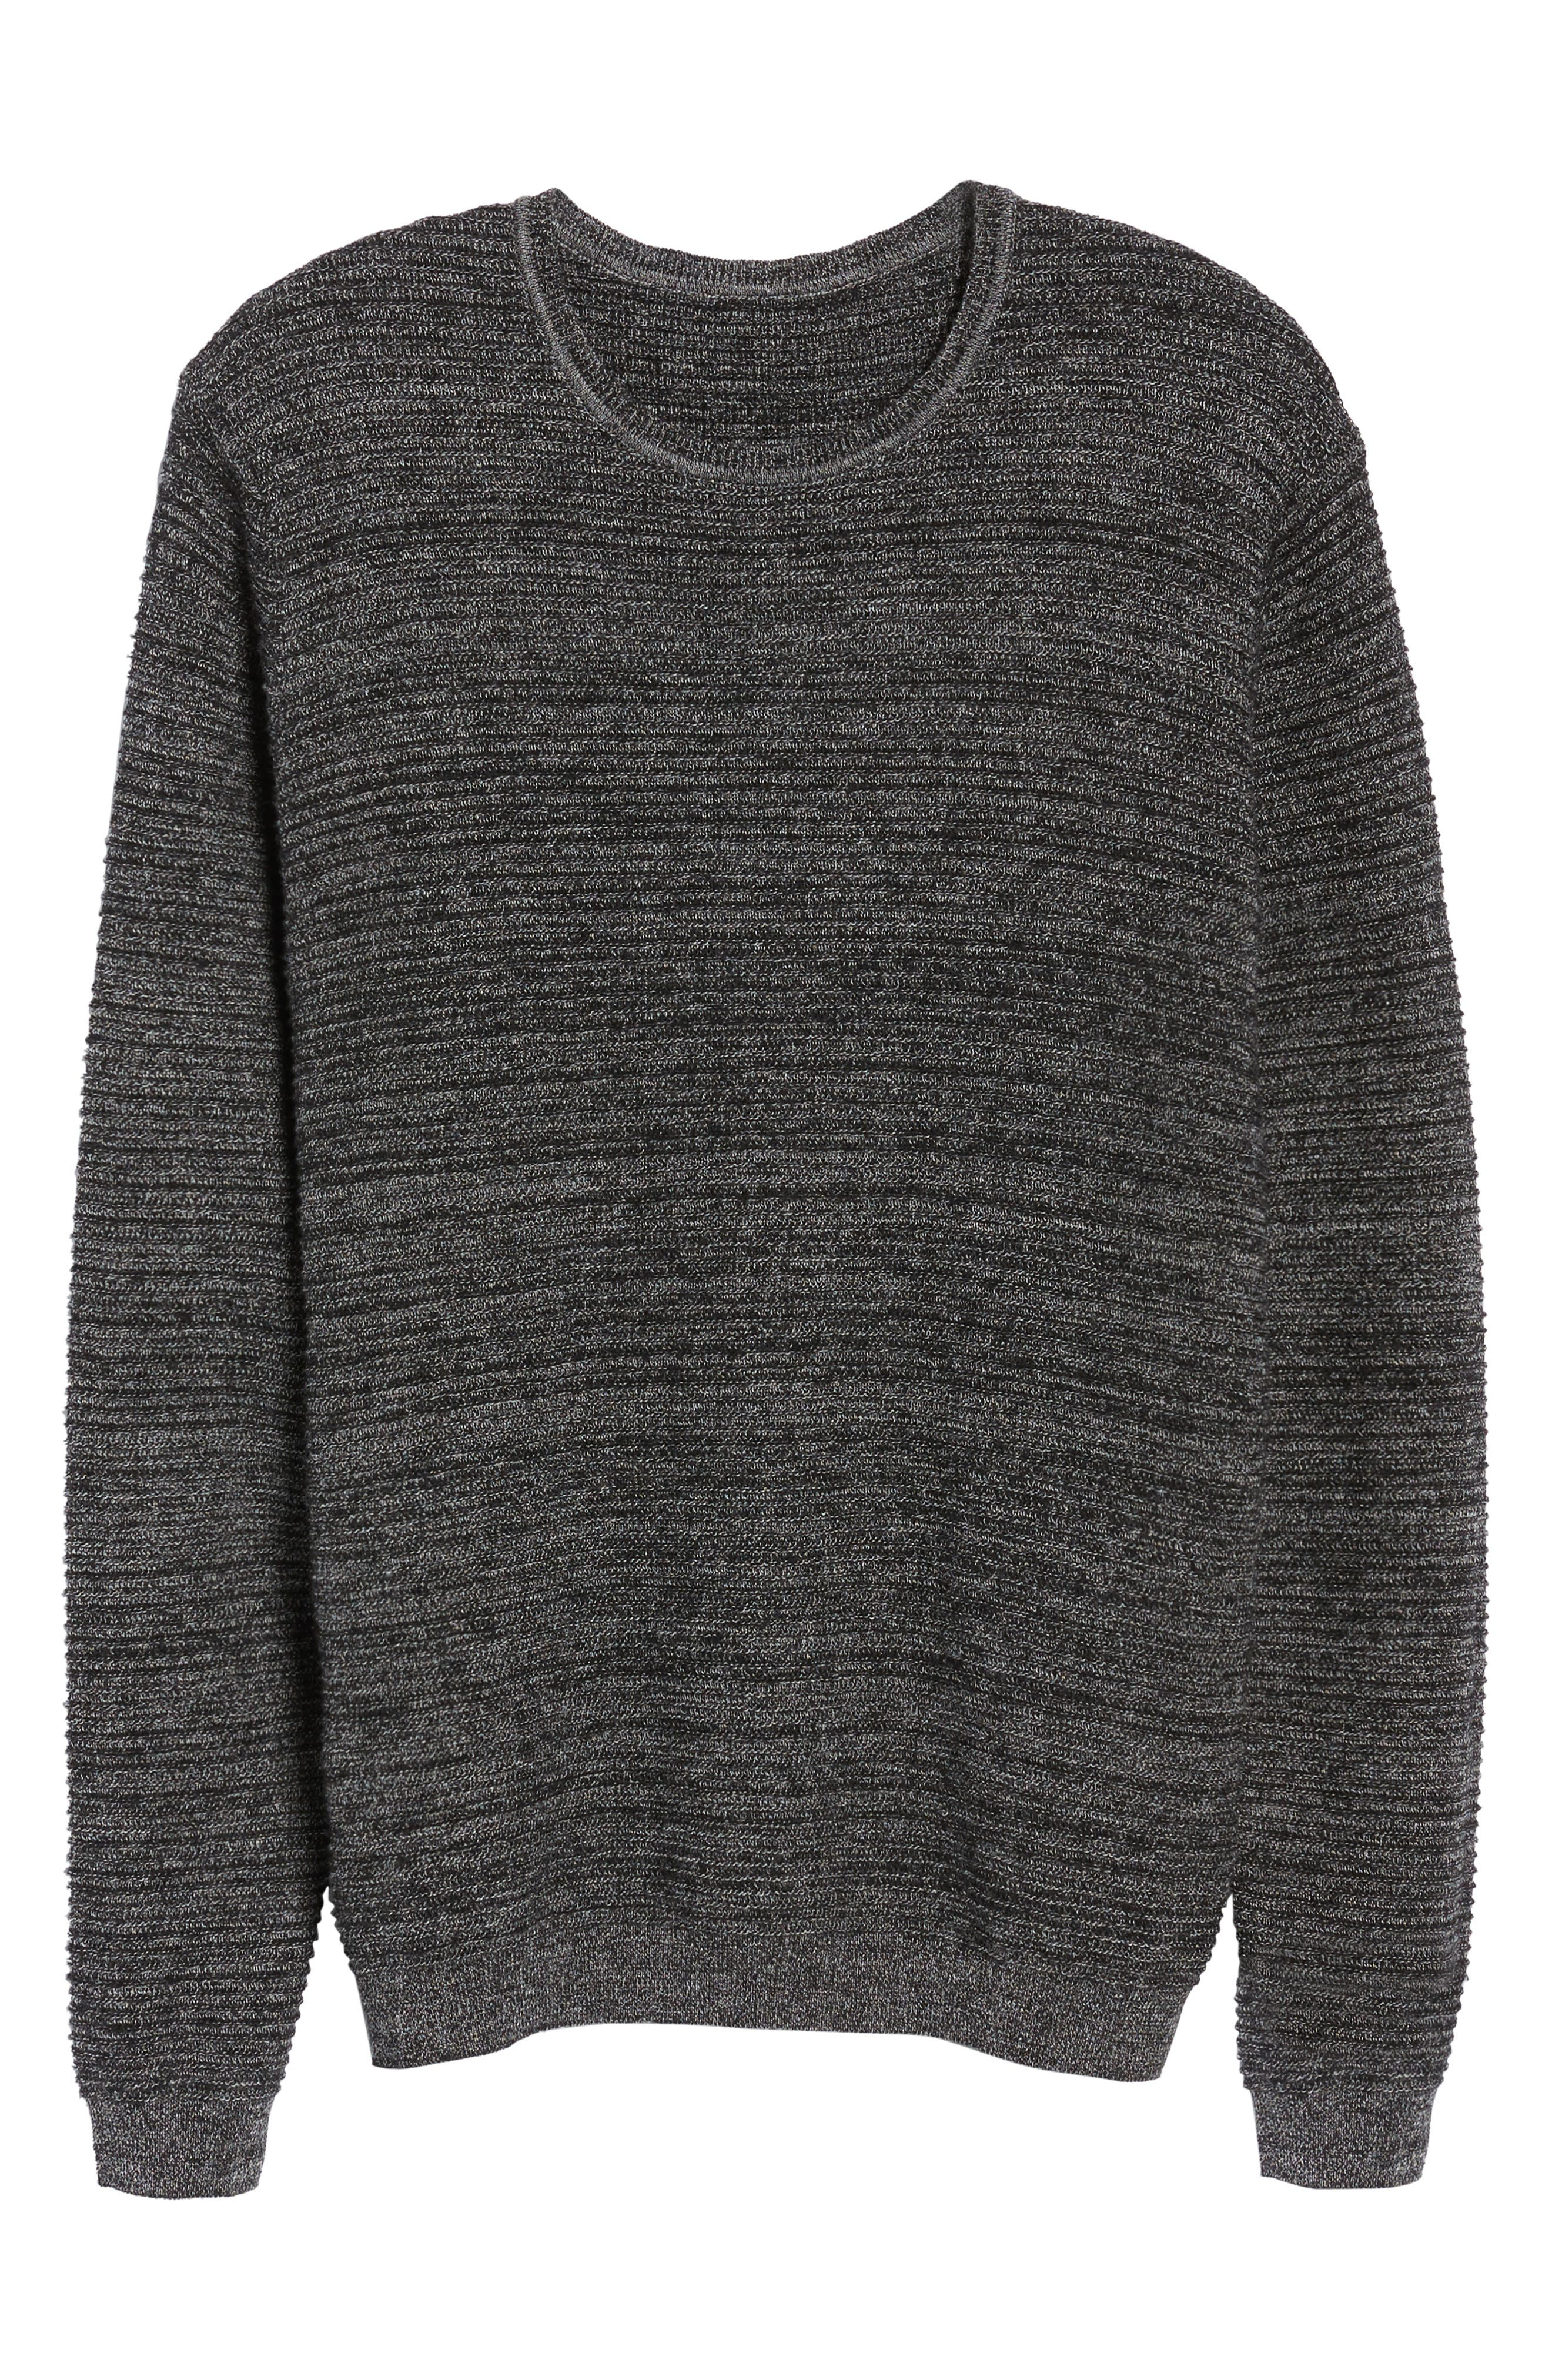 Ottoman Wool Blend Sweater,                             Alternate thumbnail 6, color,                             001